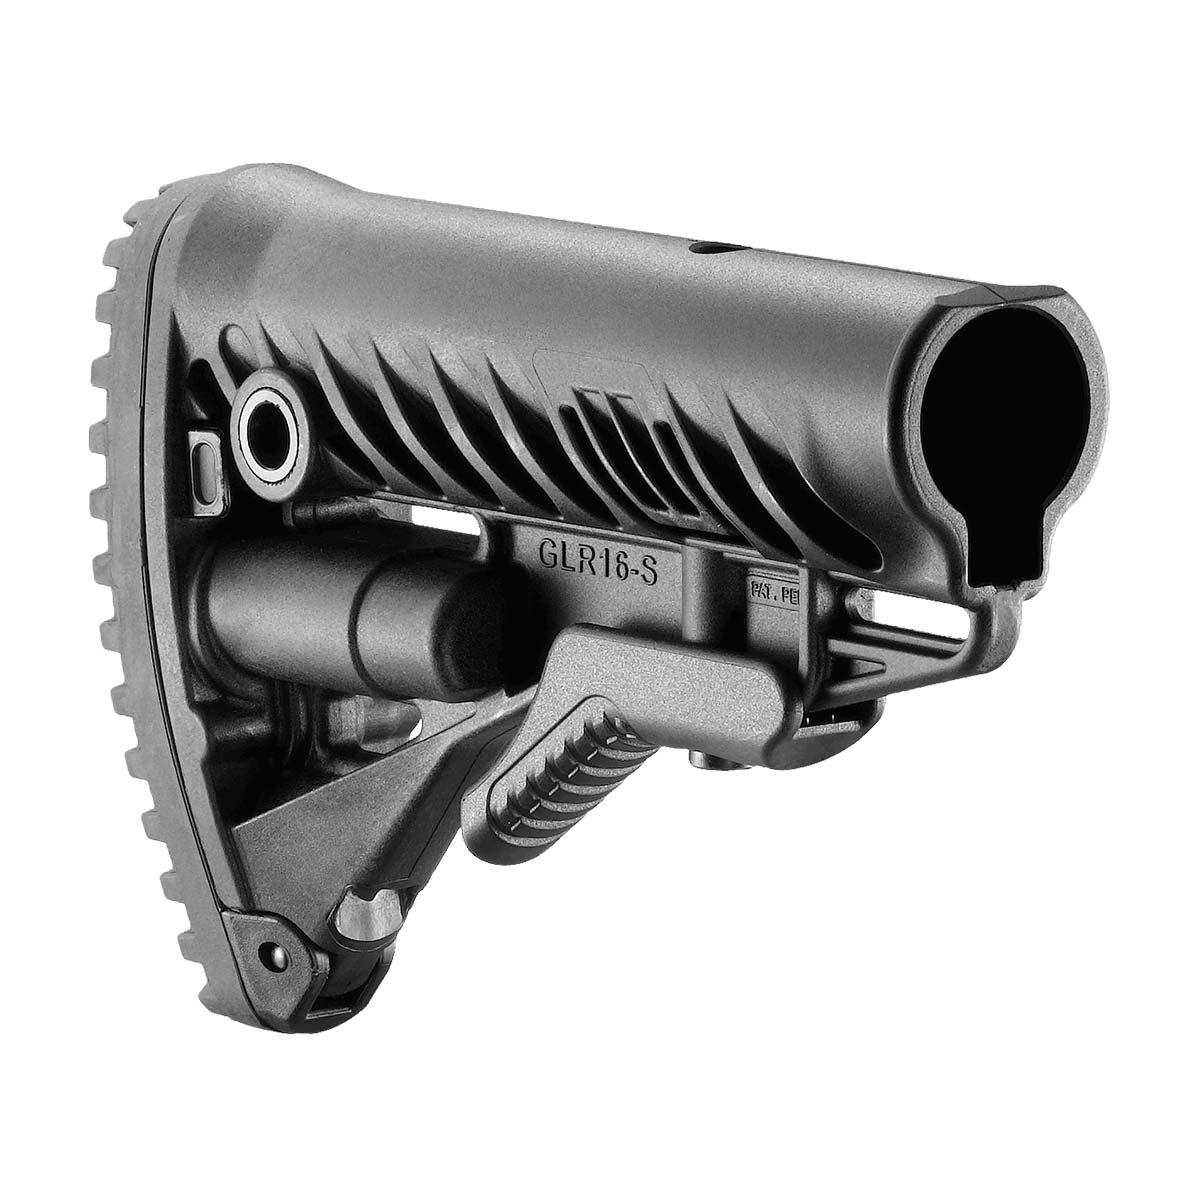 fab-defense-ar15-butt-stock-glr-16-2